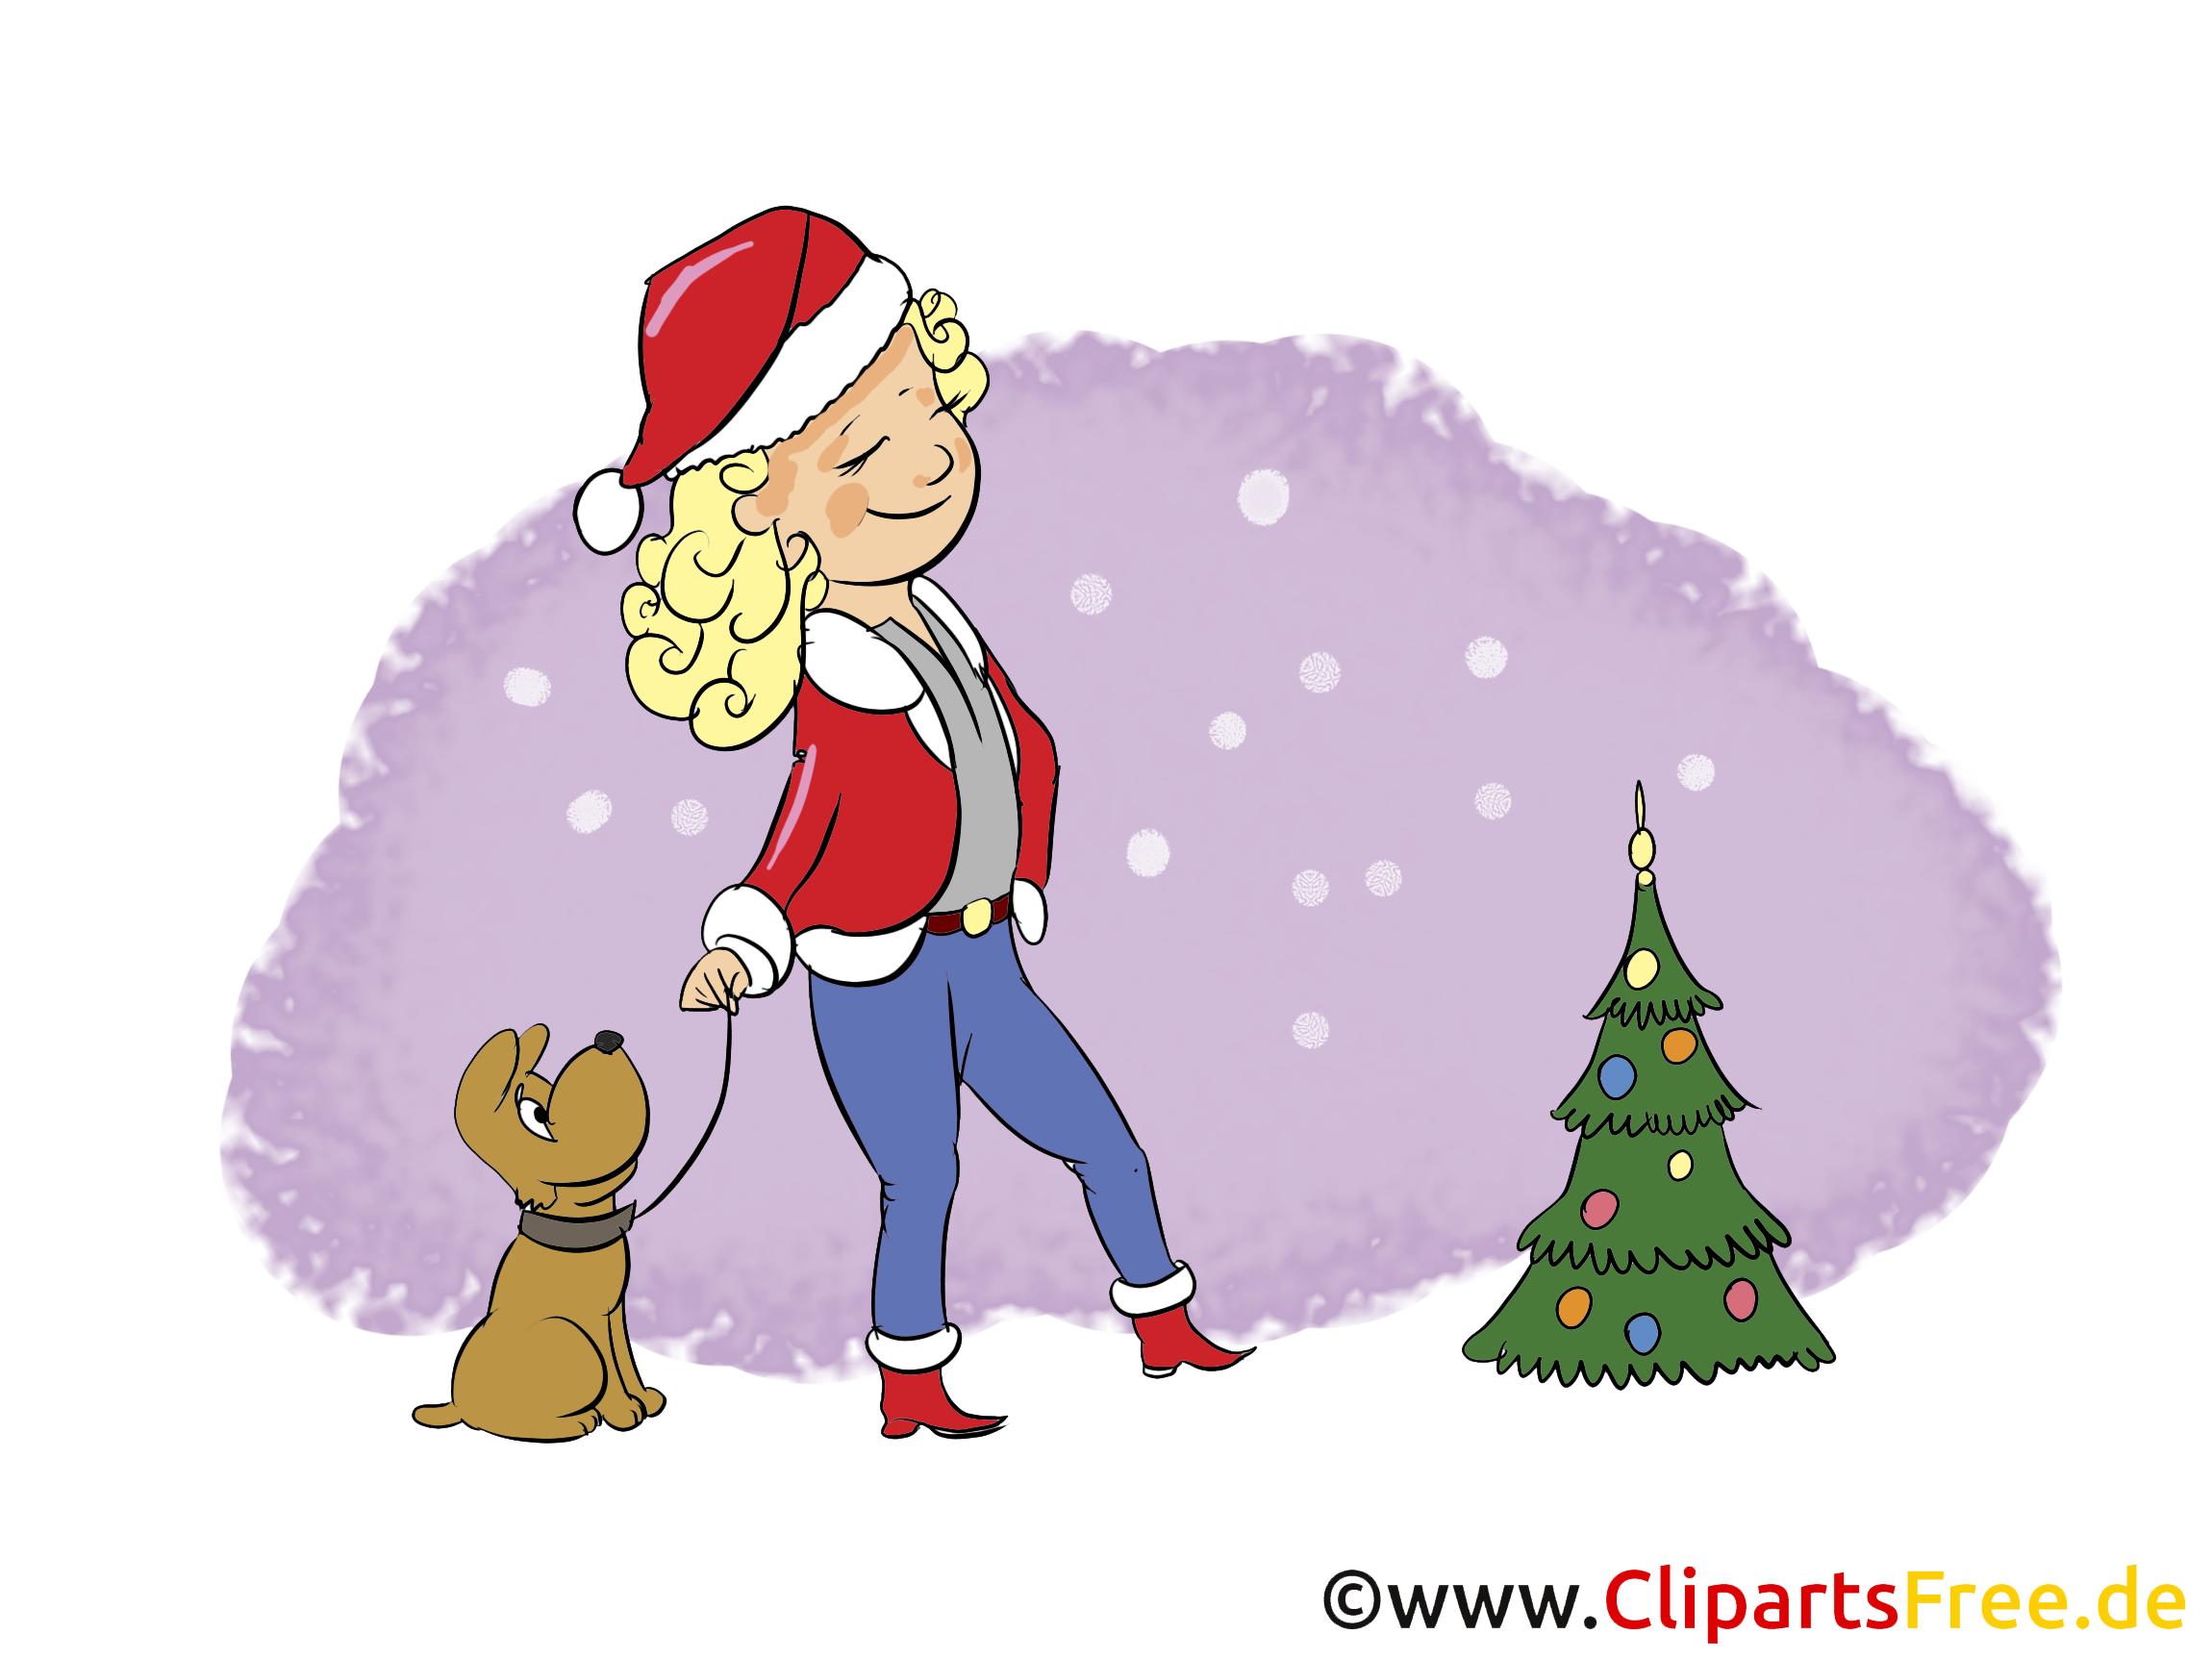 silvester weihnachten bild clip art image cartoon gratis